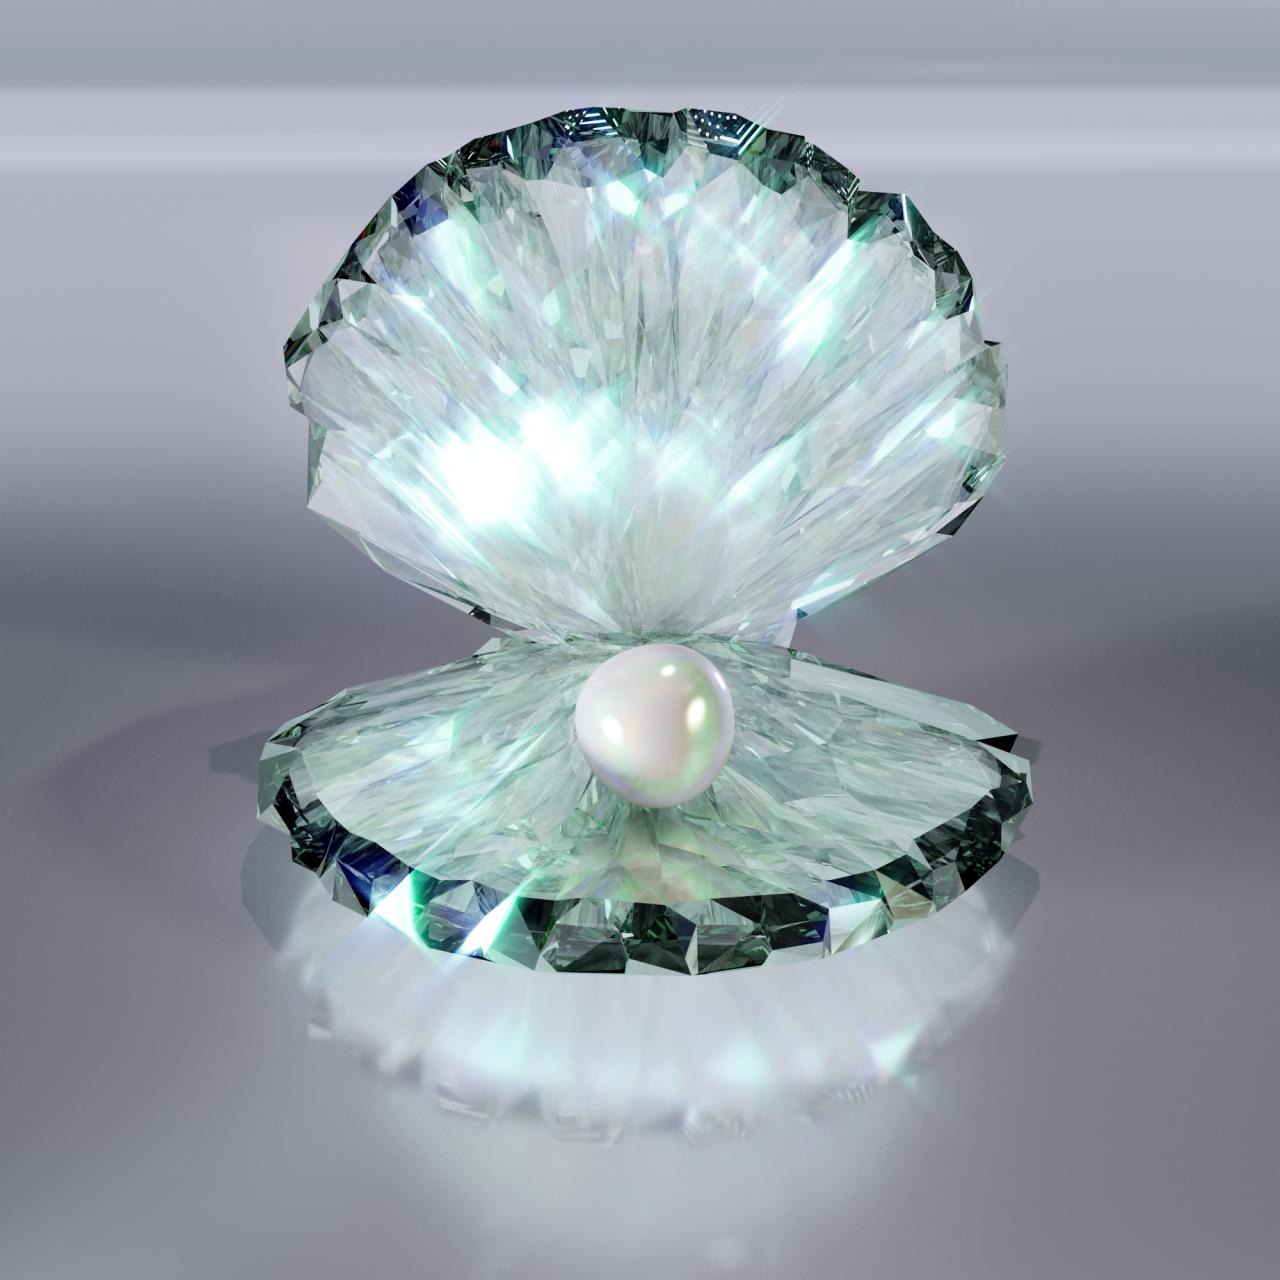 Crystal Clam